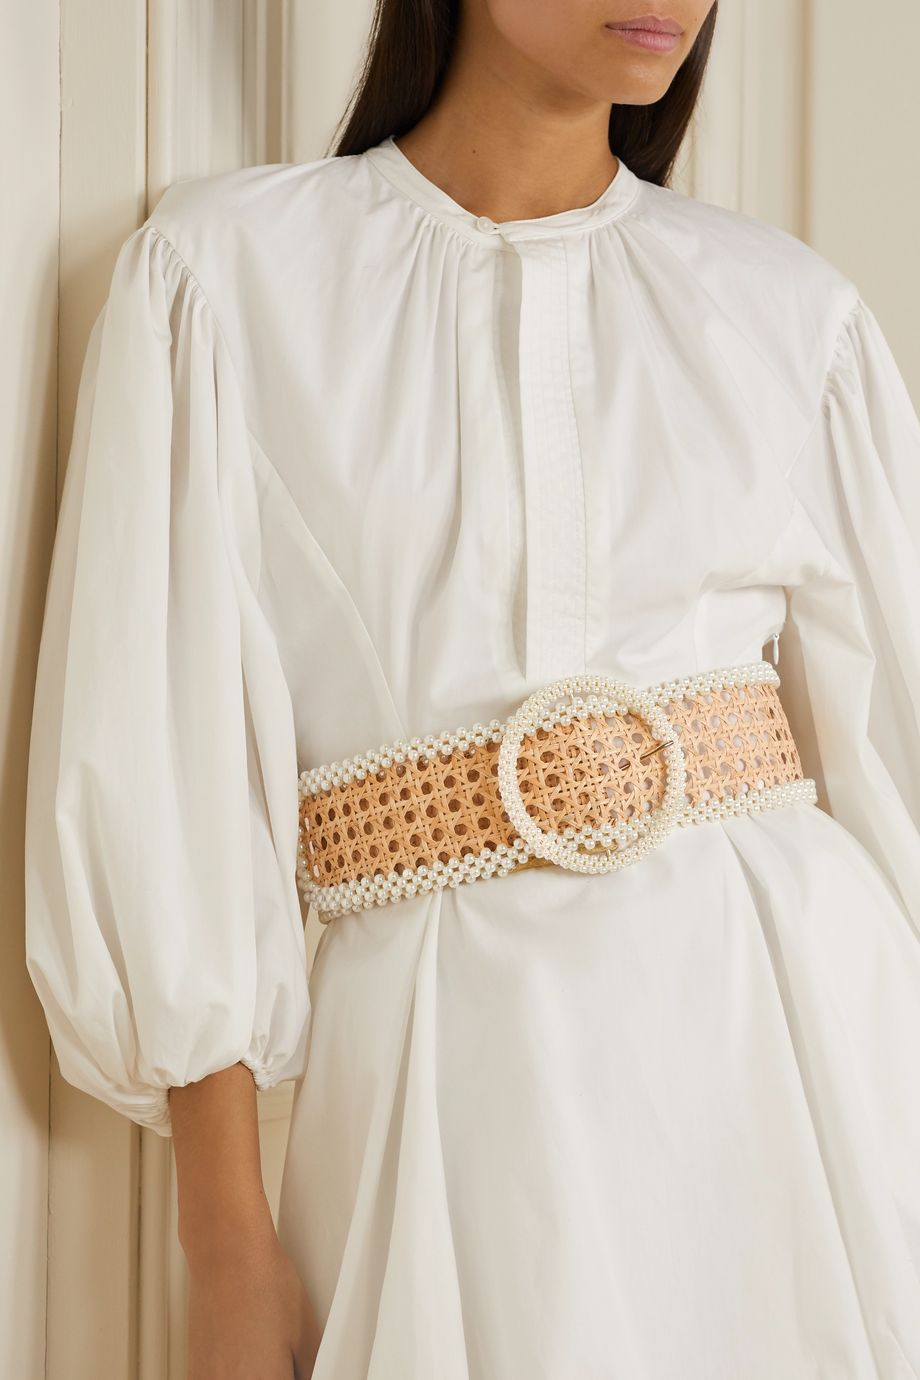 Rosantica Mamba 人造珍珠缀饰柳条腰带